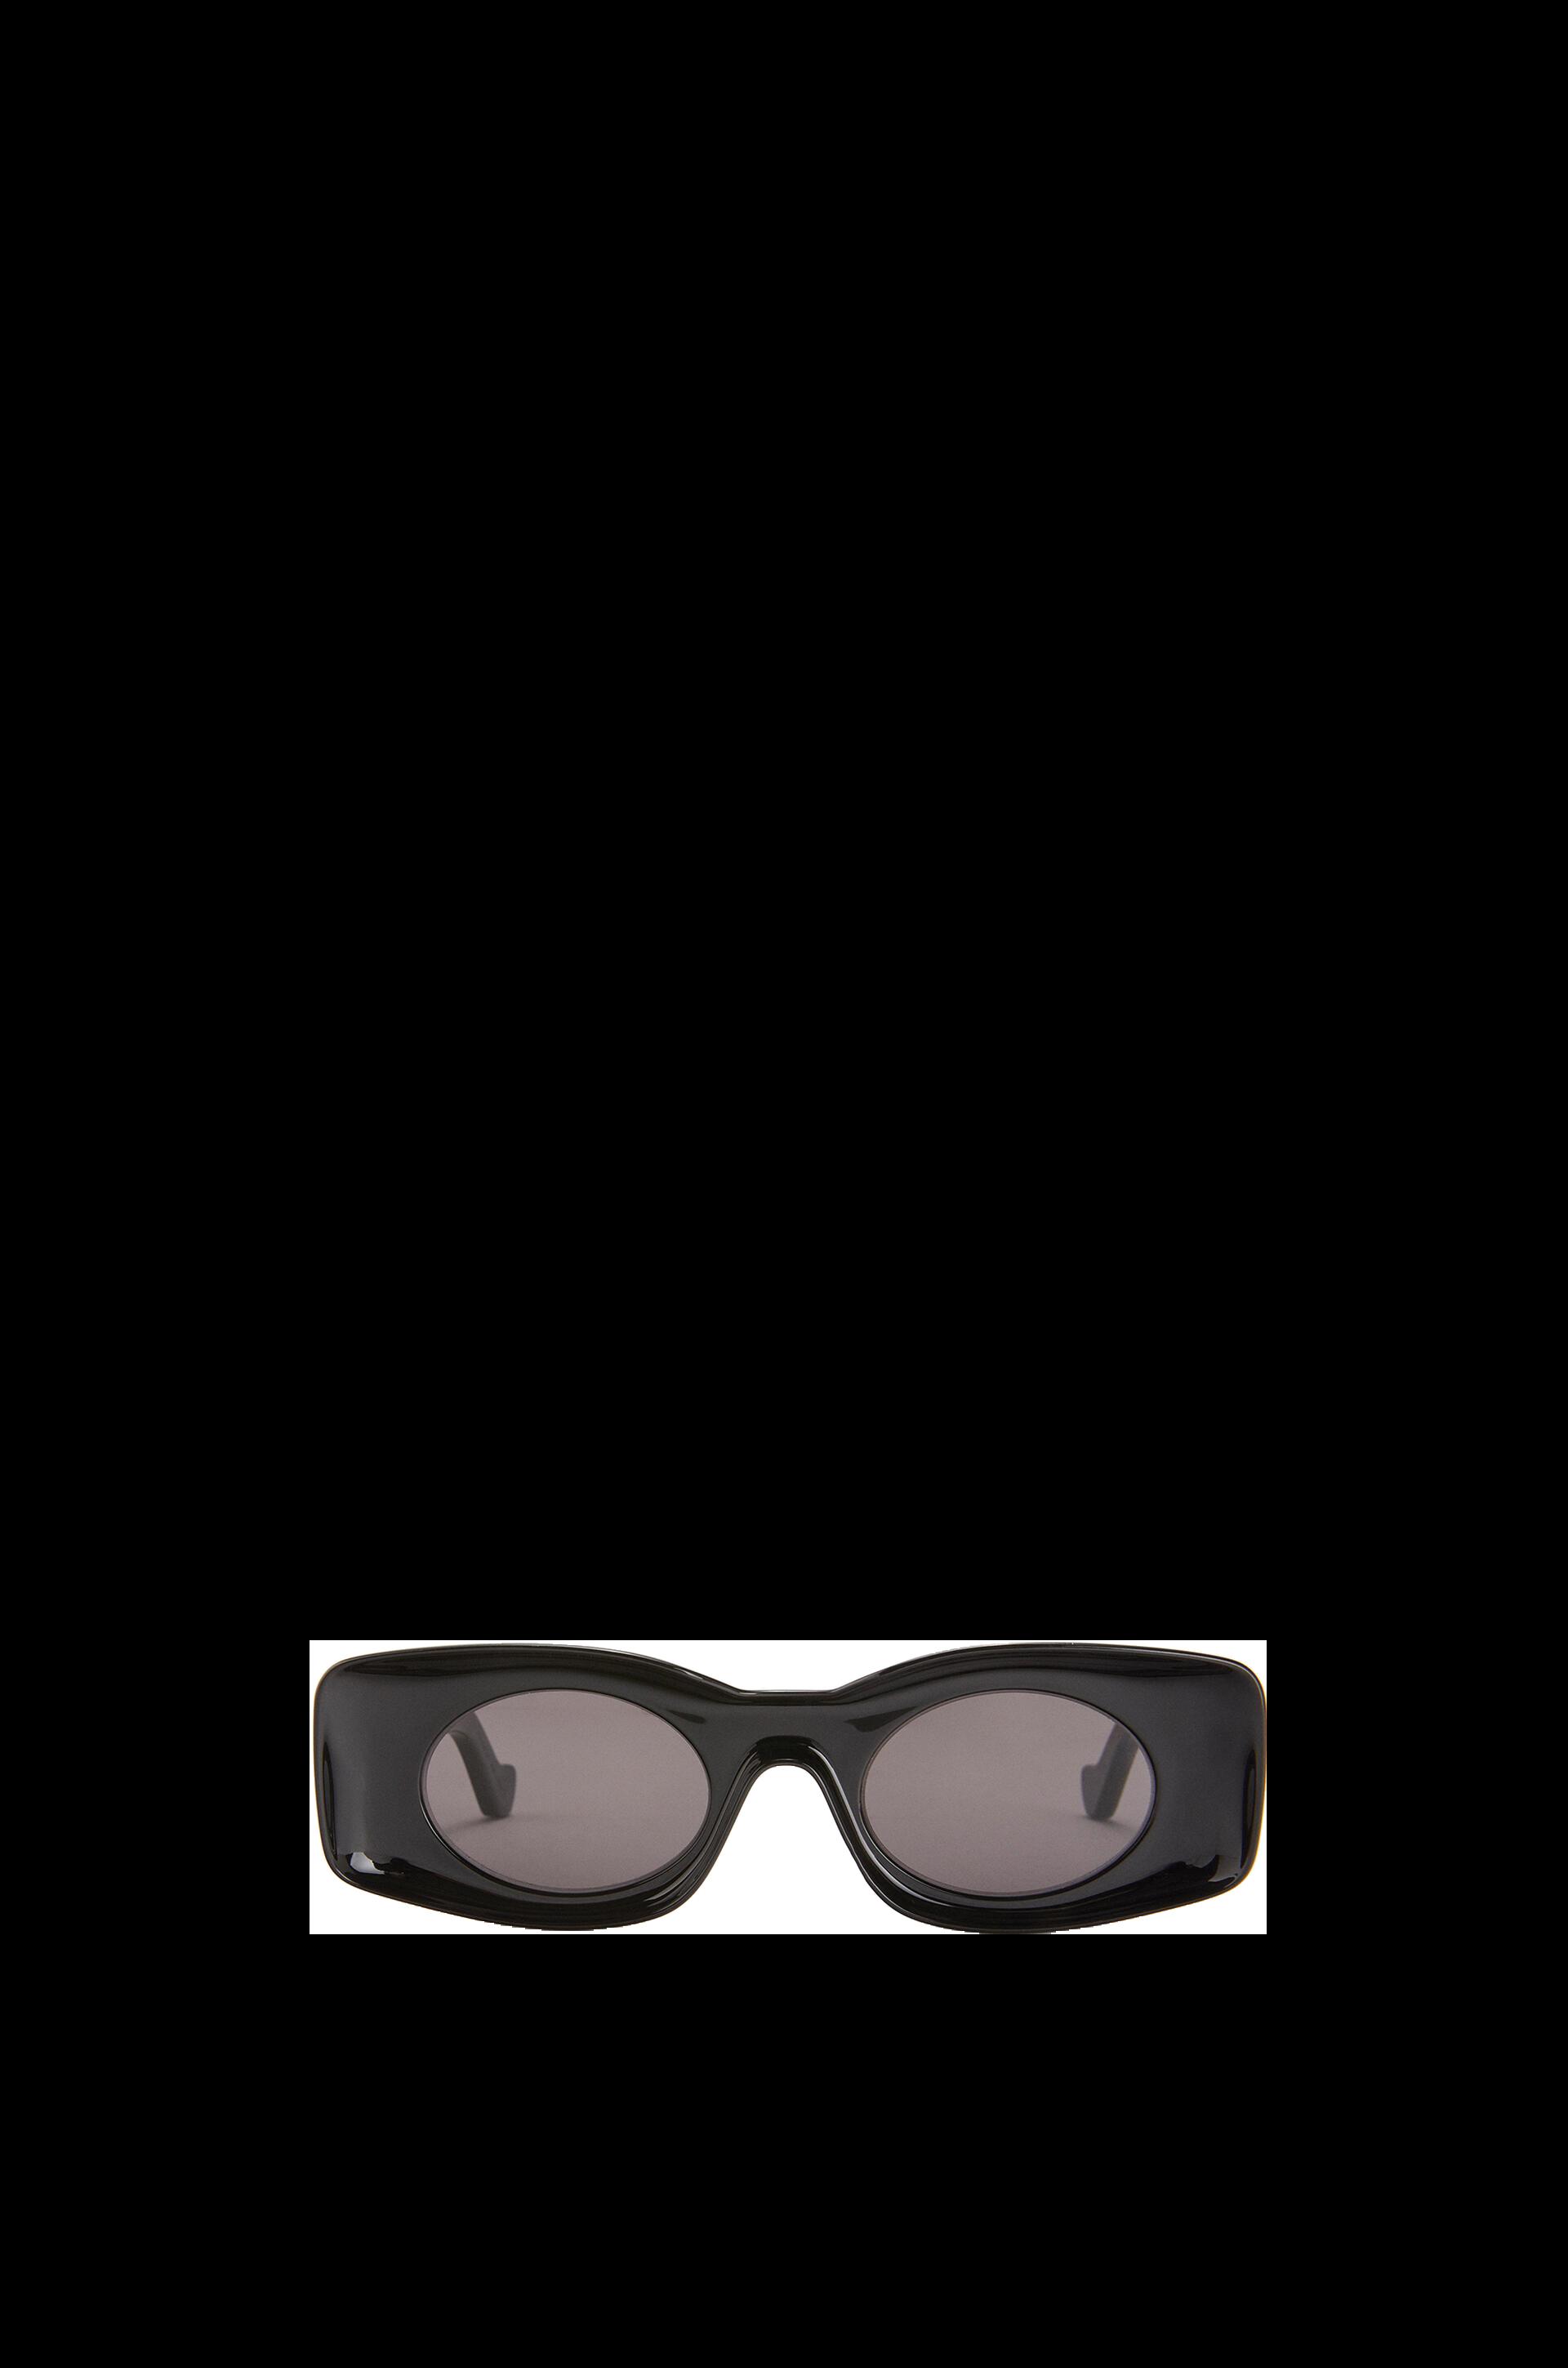 Sunglasses Guide 2021 - Loewe